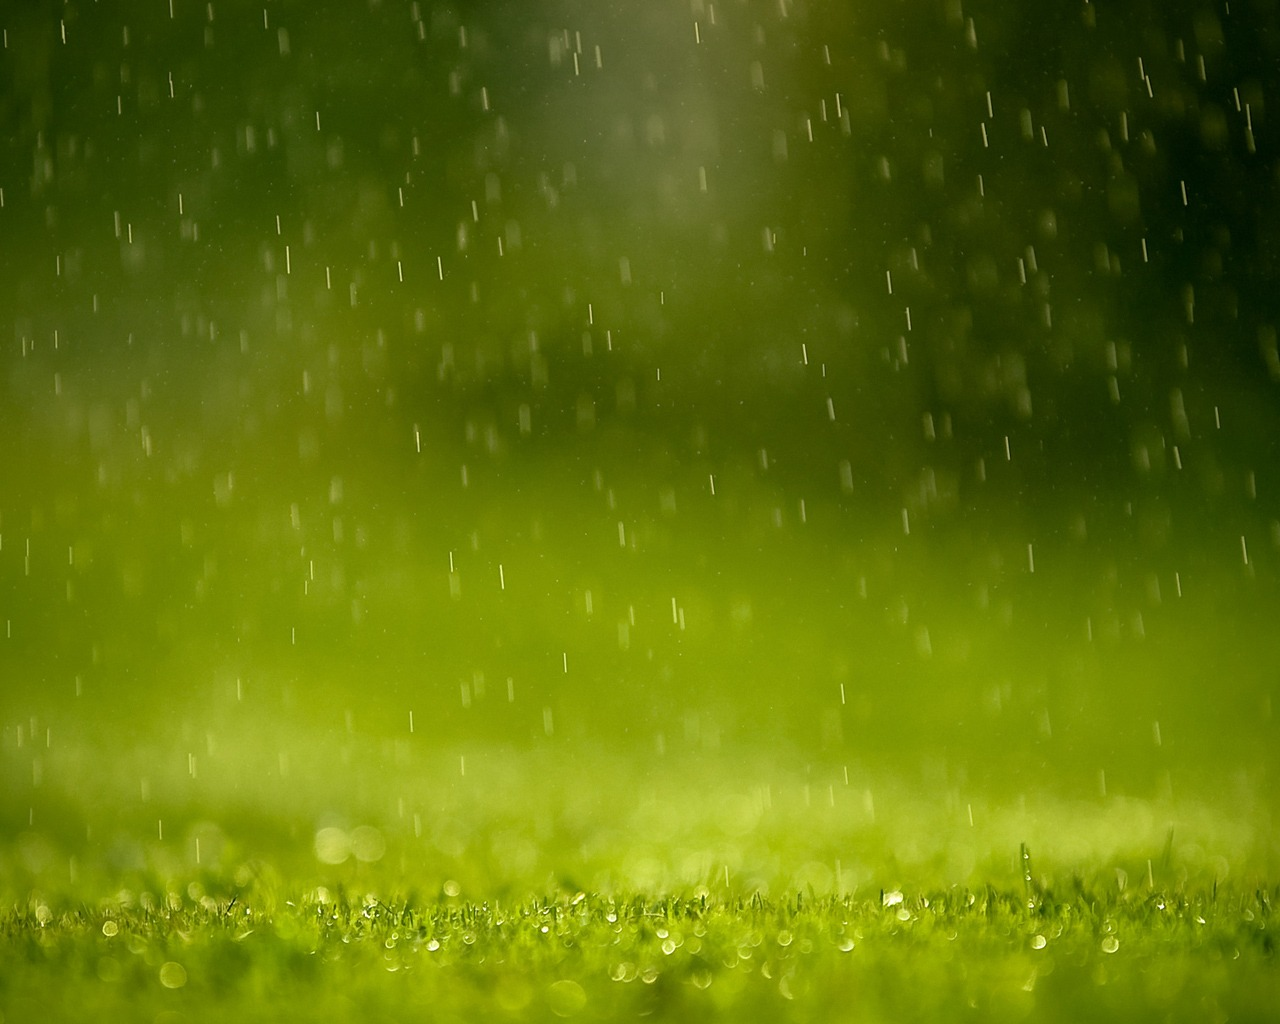 rain wallpaper grass   2765   The Wondrous Pics 1280x1024